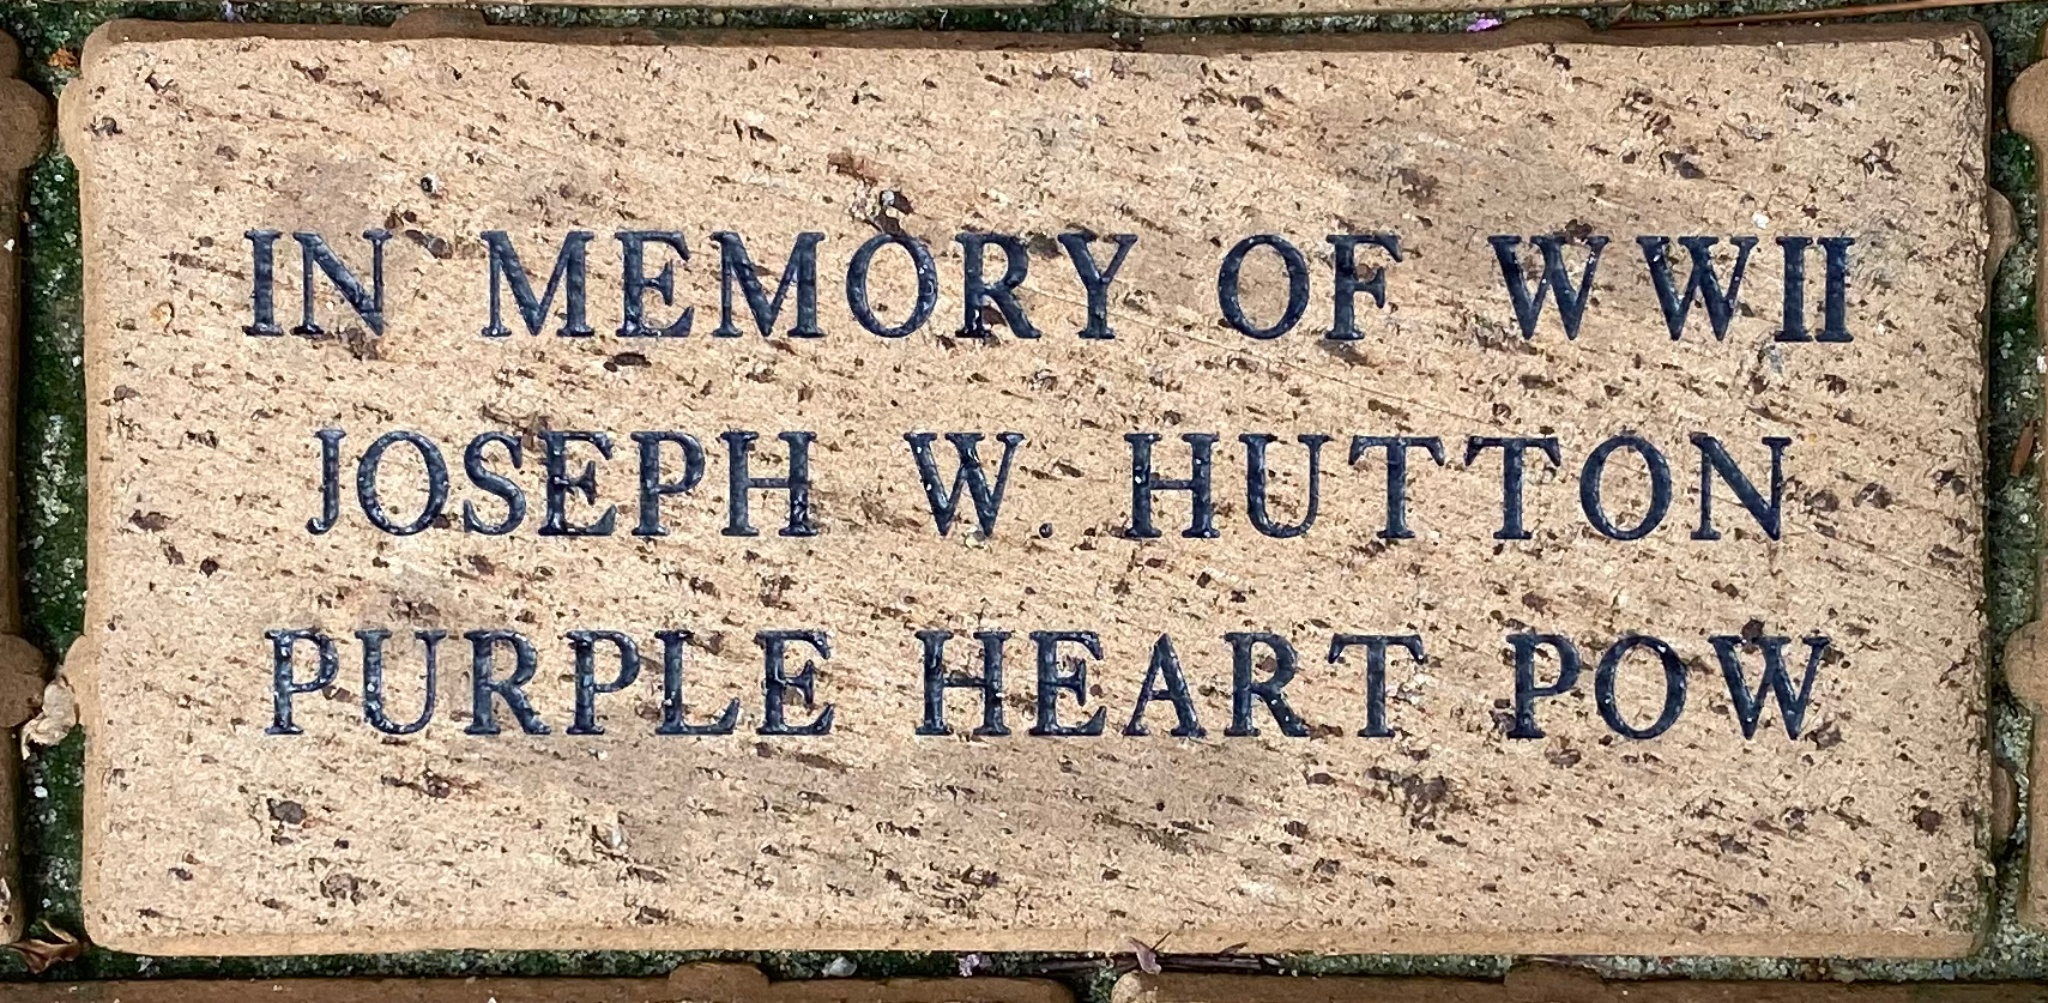 IN MEMORY OF WWII  JOSEPH W. HUTTON PURPLE HEART POW